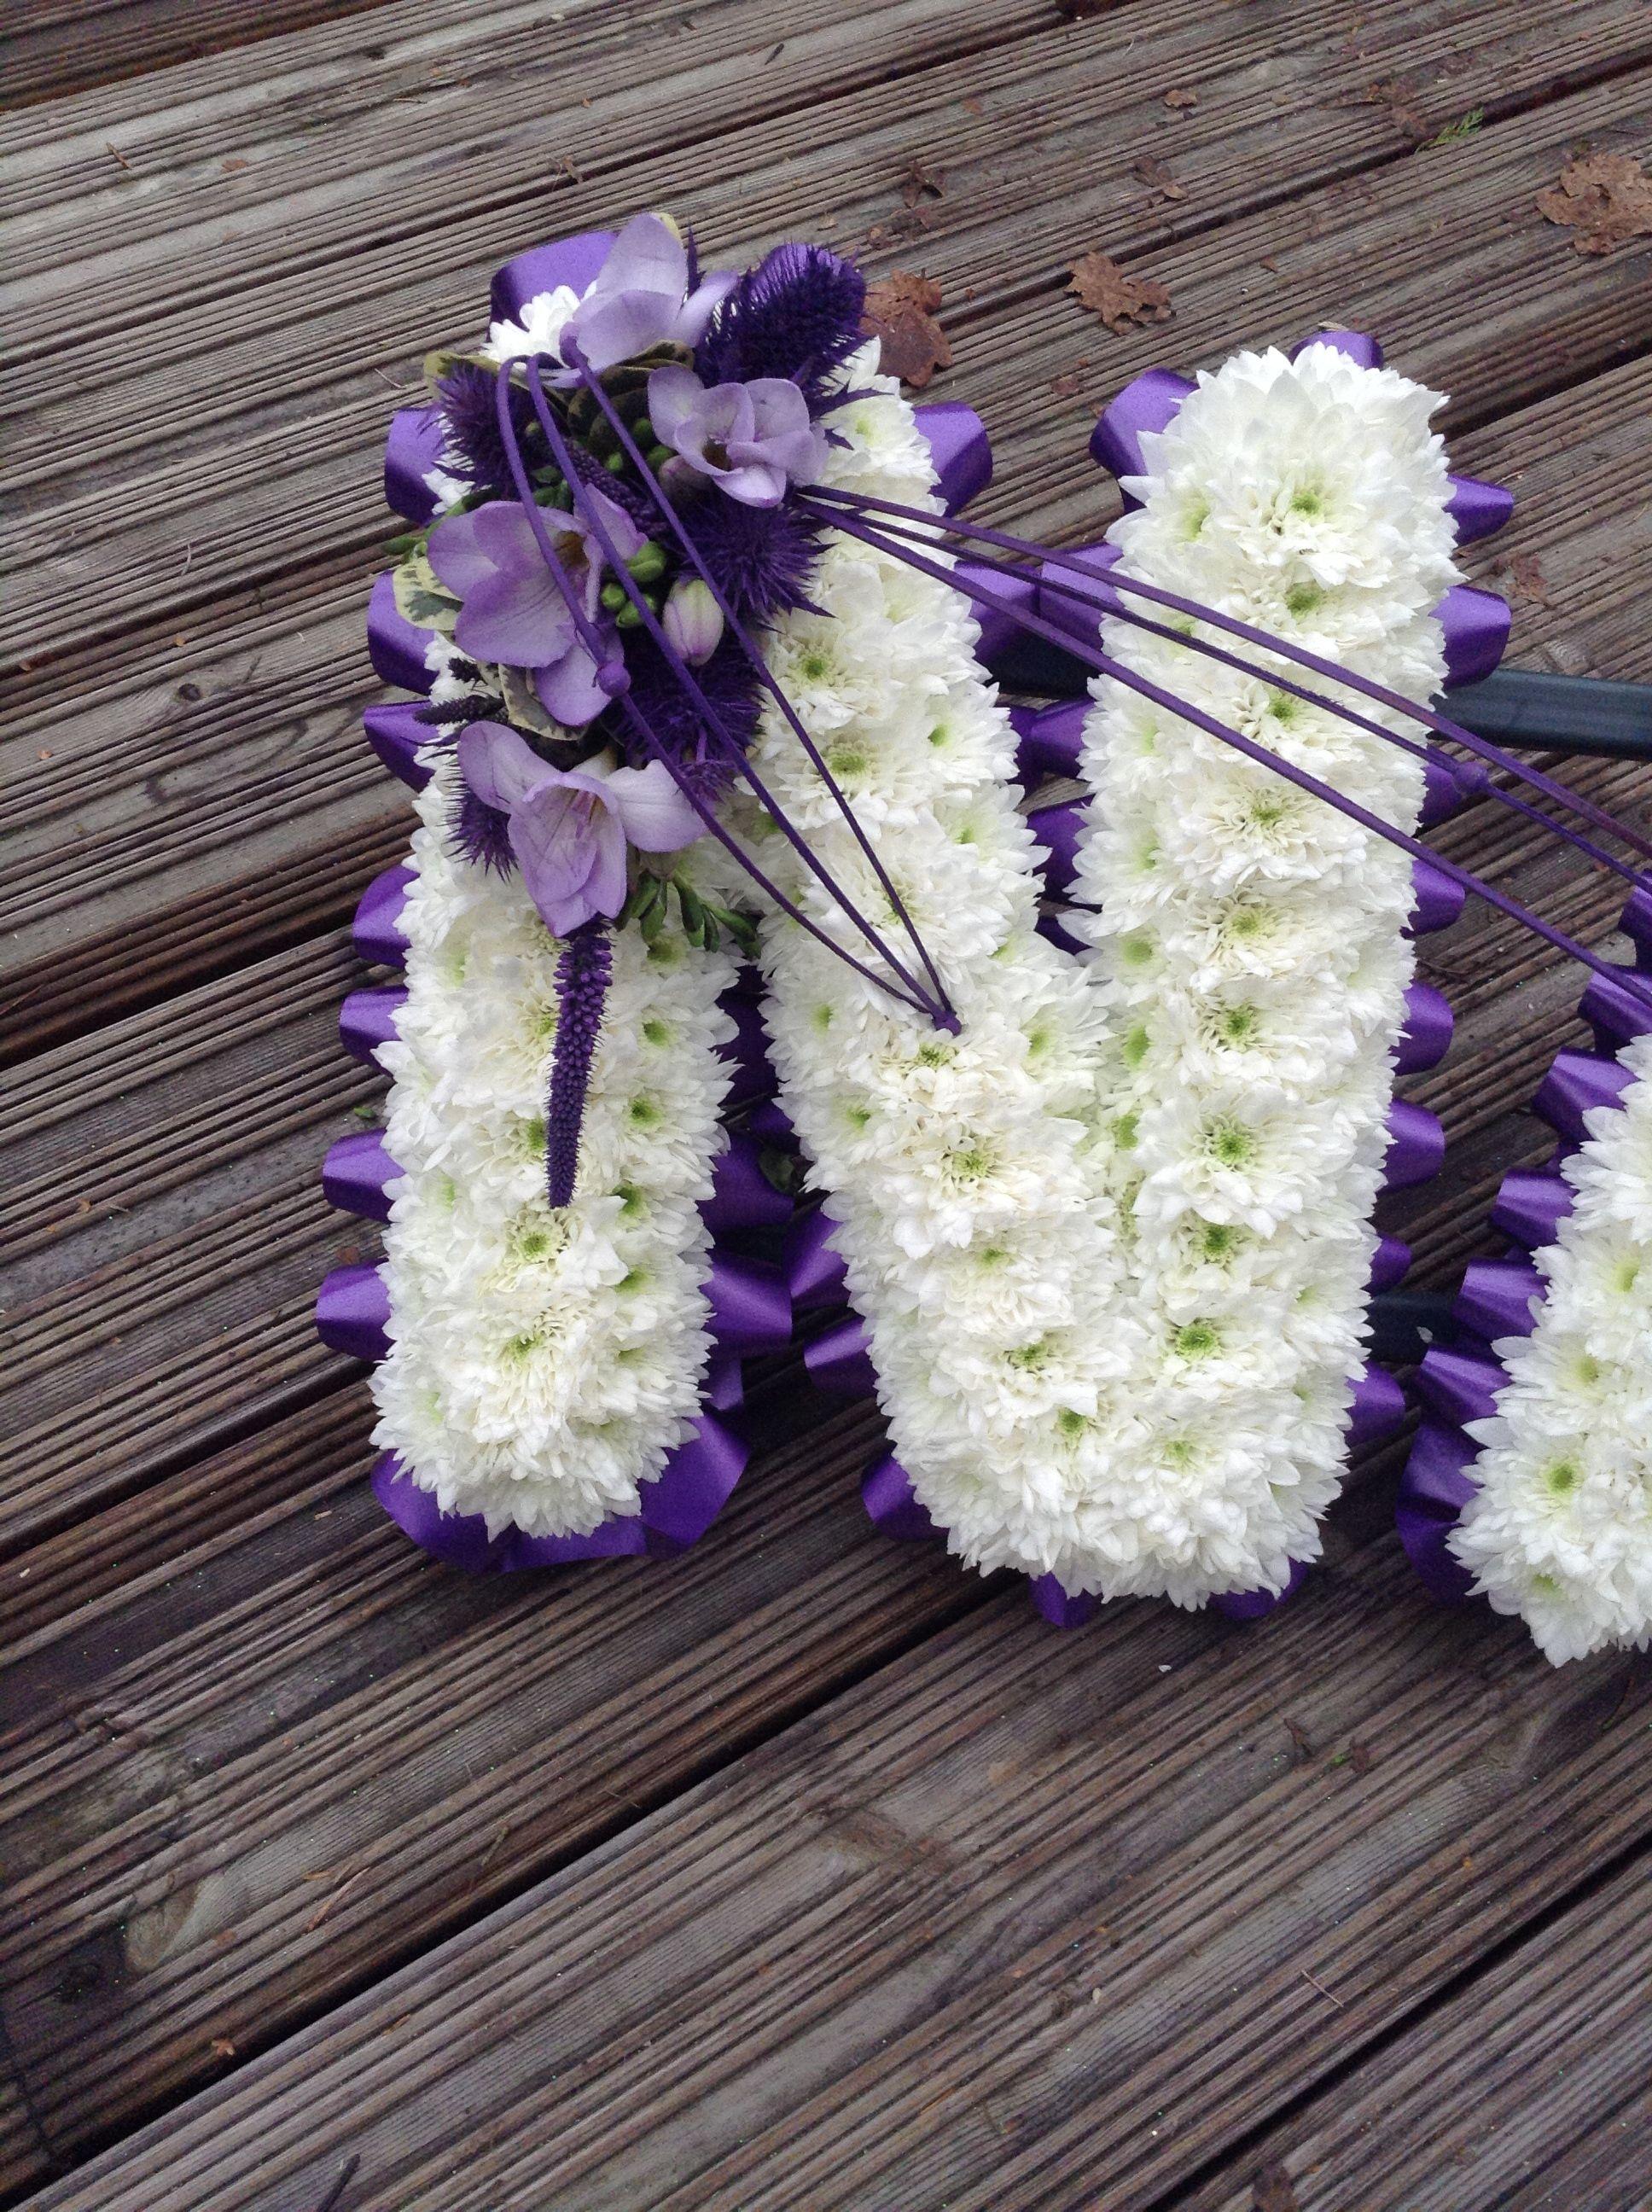 Best 25 Funeral Homes Ideas On Pinterest: Best 25+ Funeral Flowers Uk Ideas On Pinterest